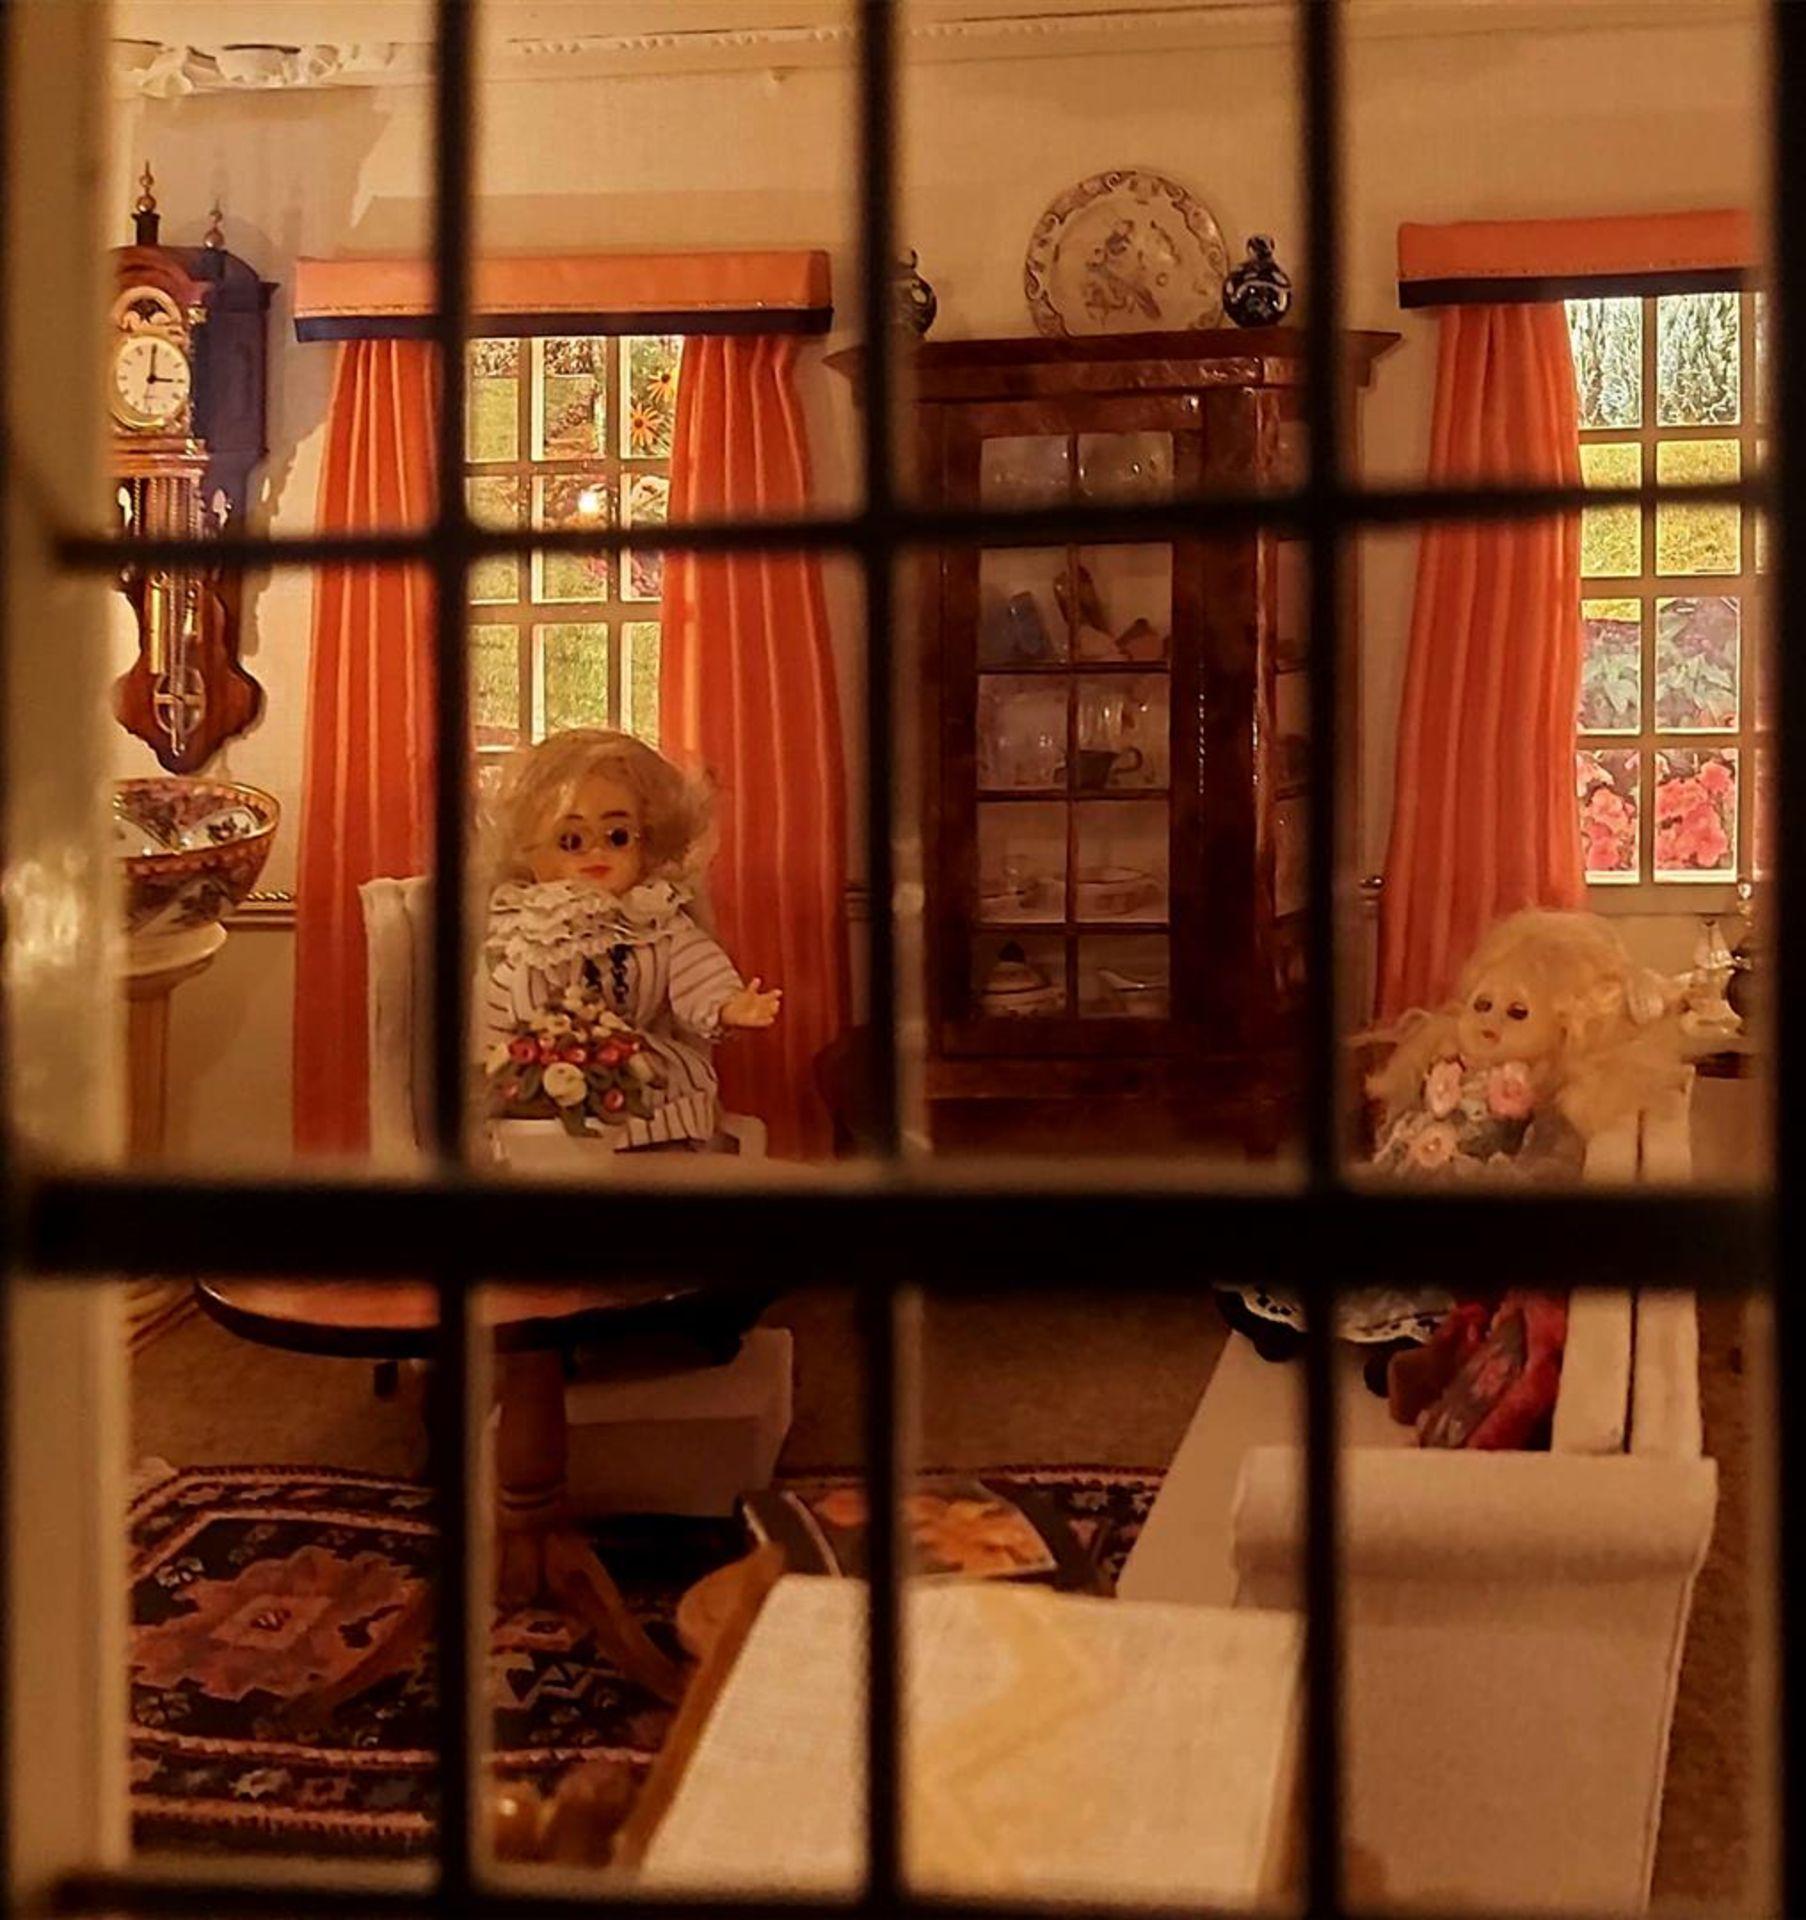 Dollhouse De Kettenborgh by Mrs. J C Wirix Kettenborg - Image 80 of 106